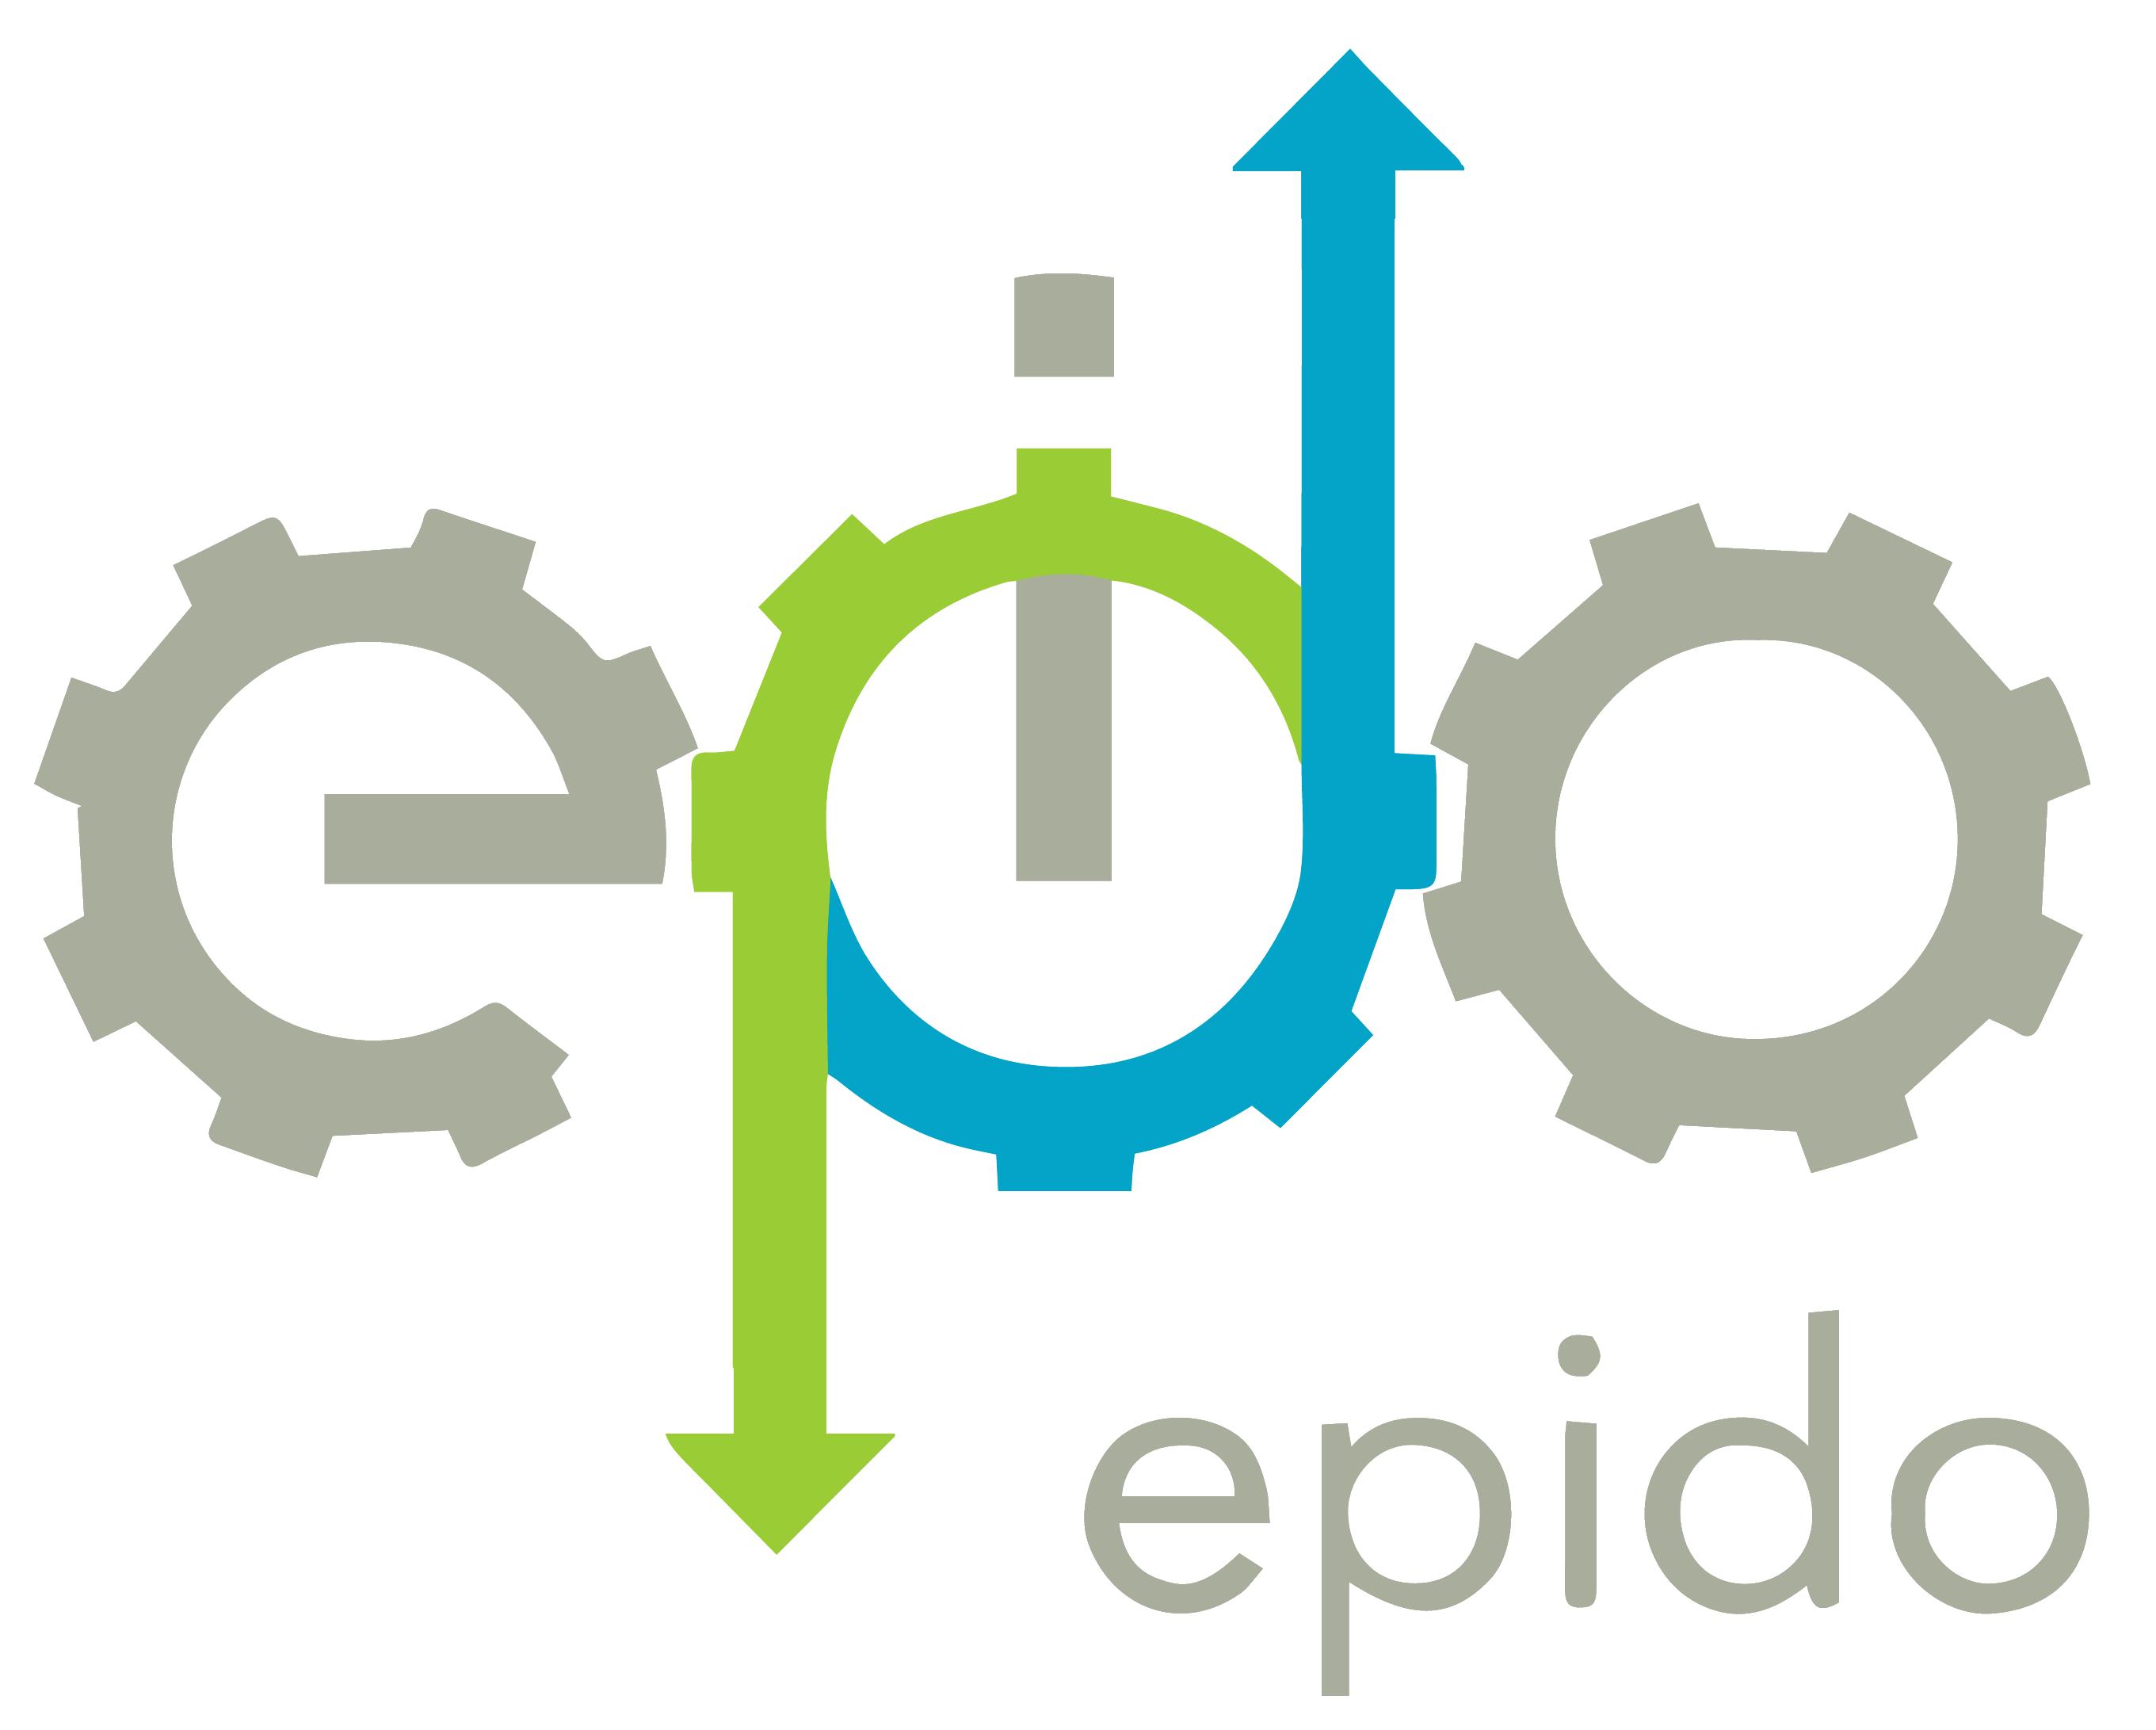 epido agile project